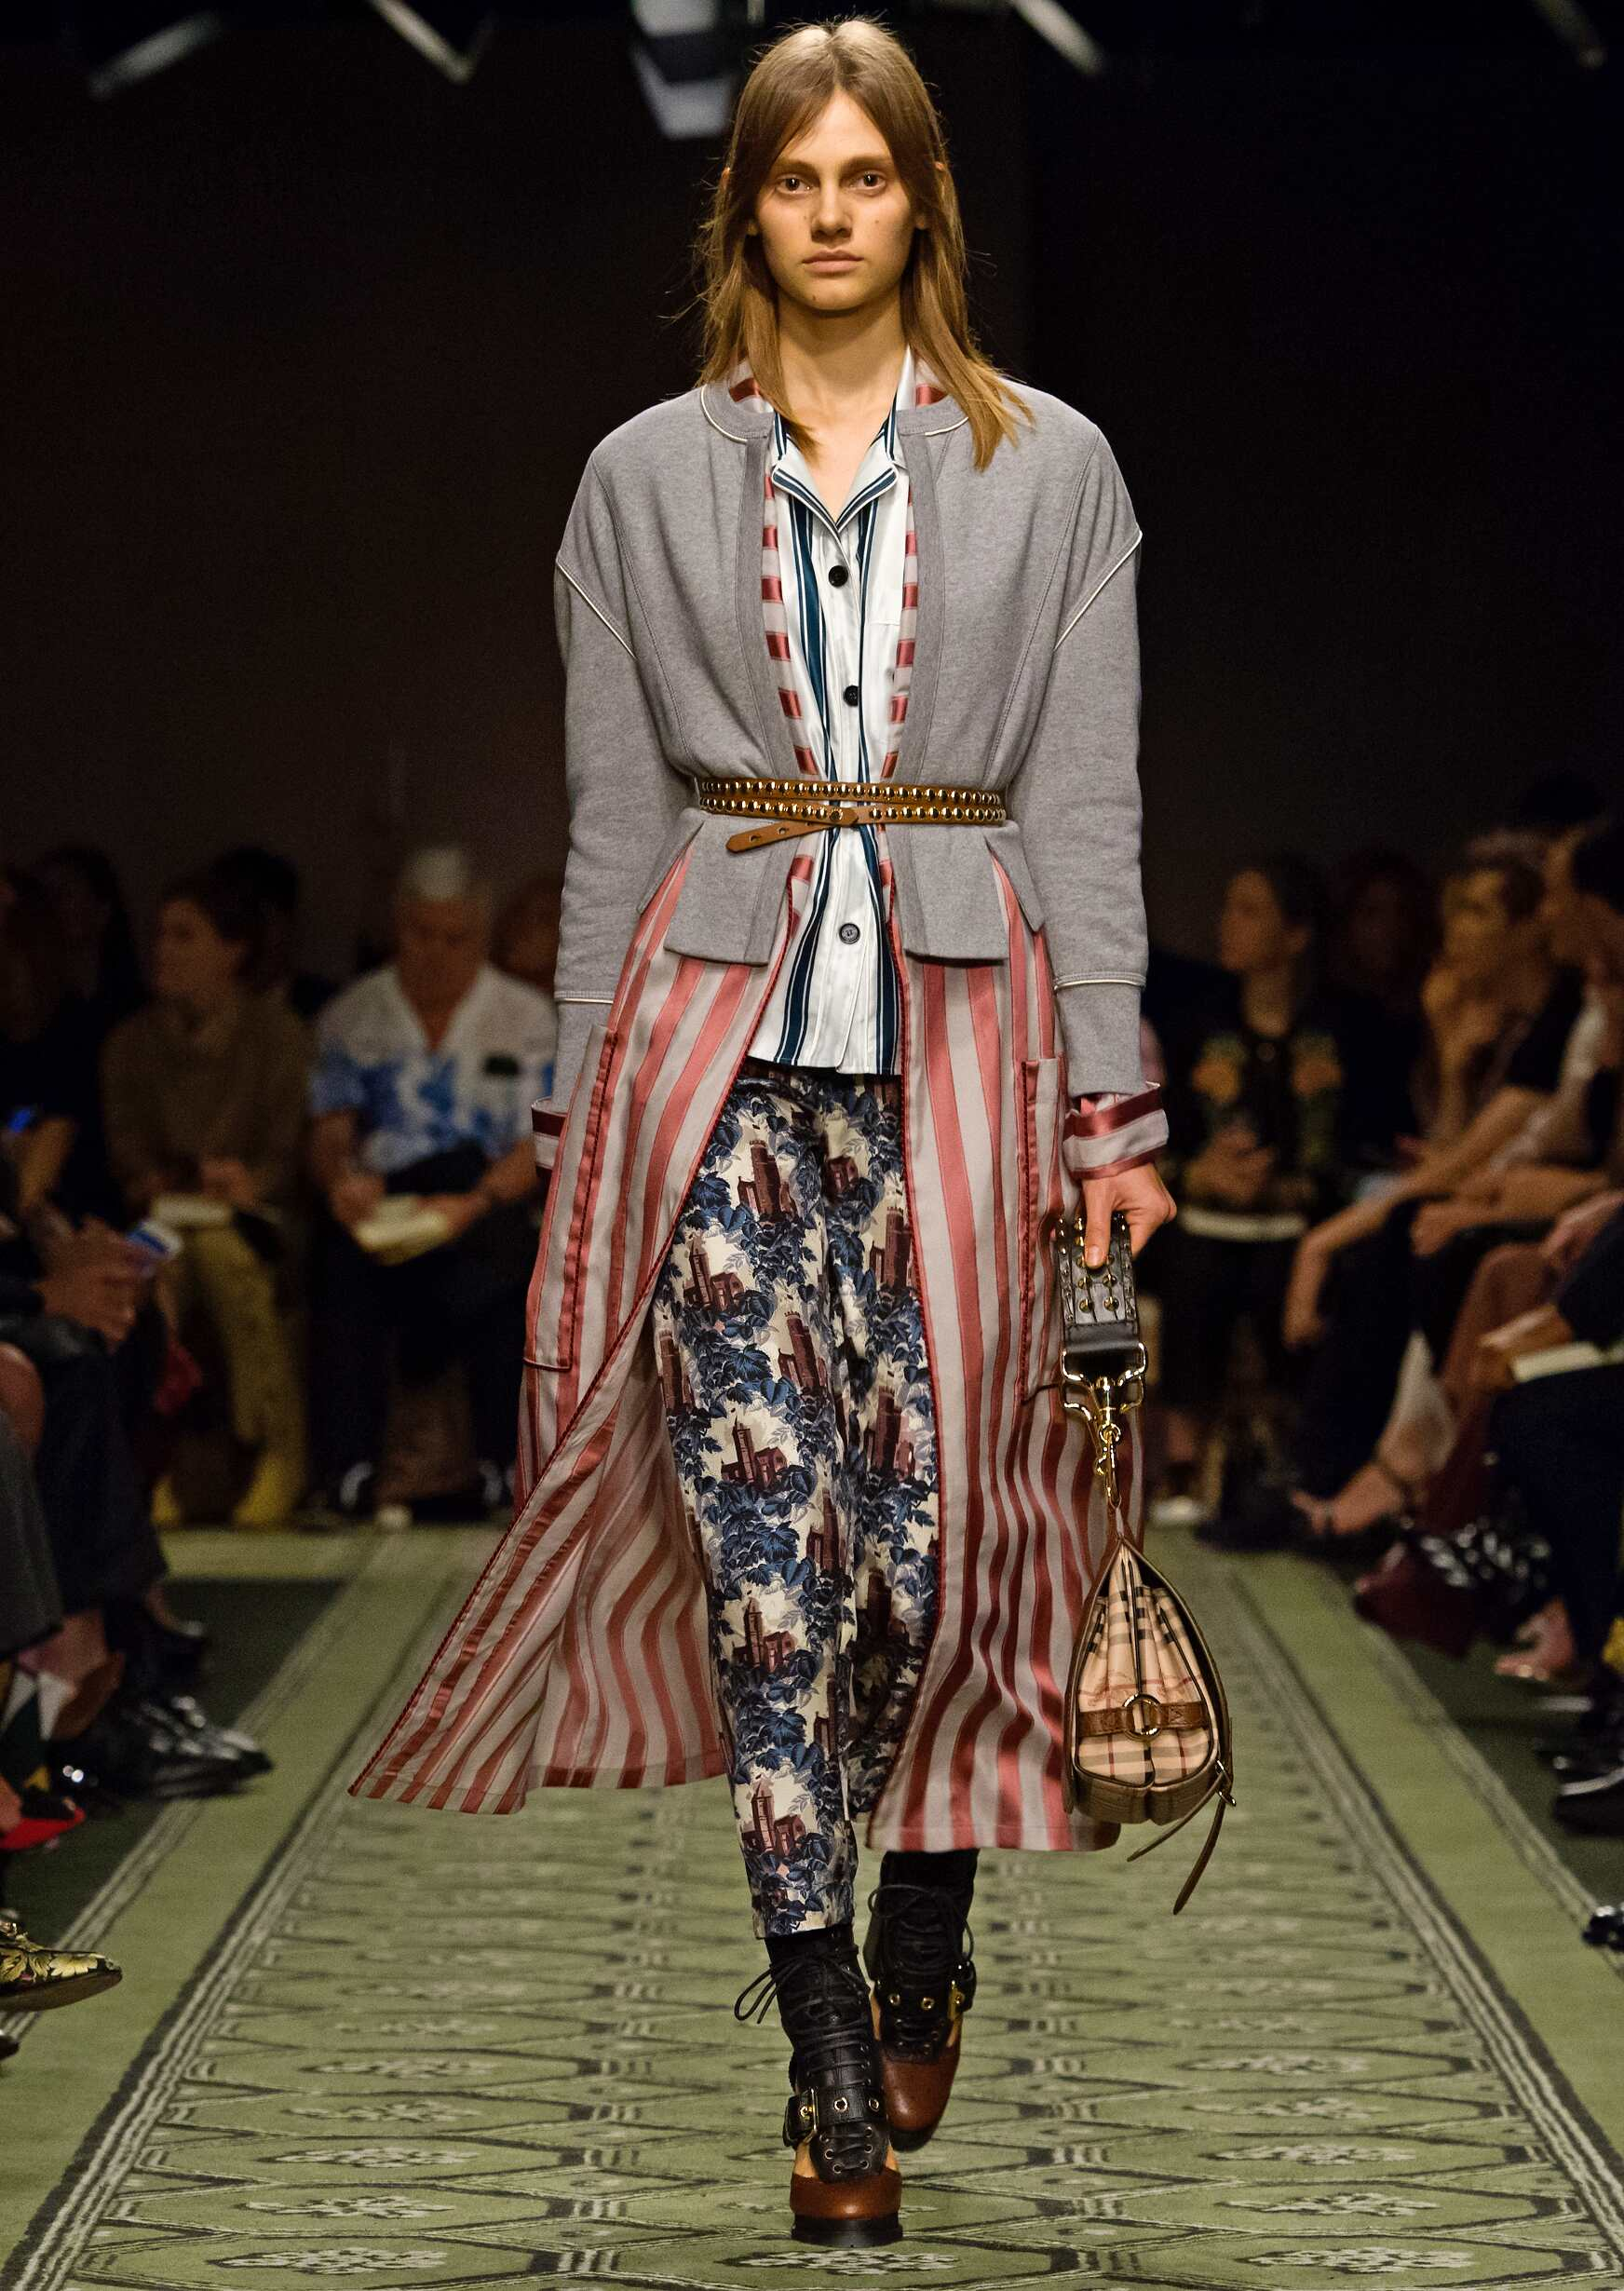 Catwalk Burberry Woman Fashion Show 2016